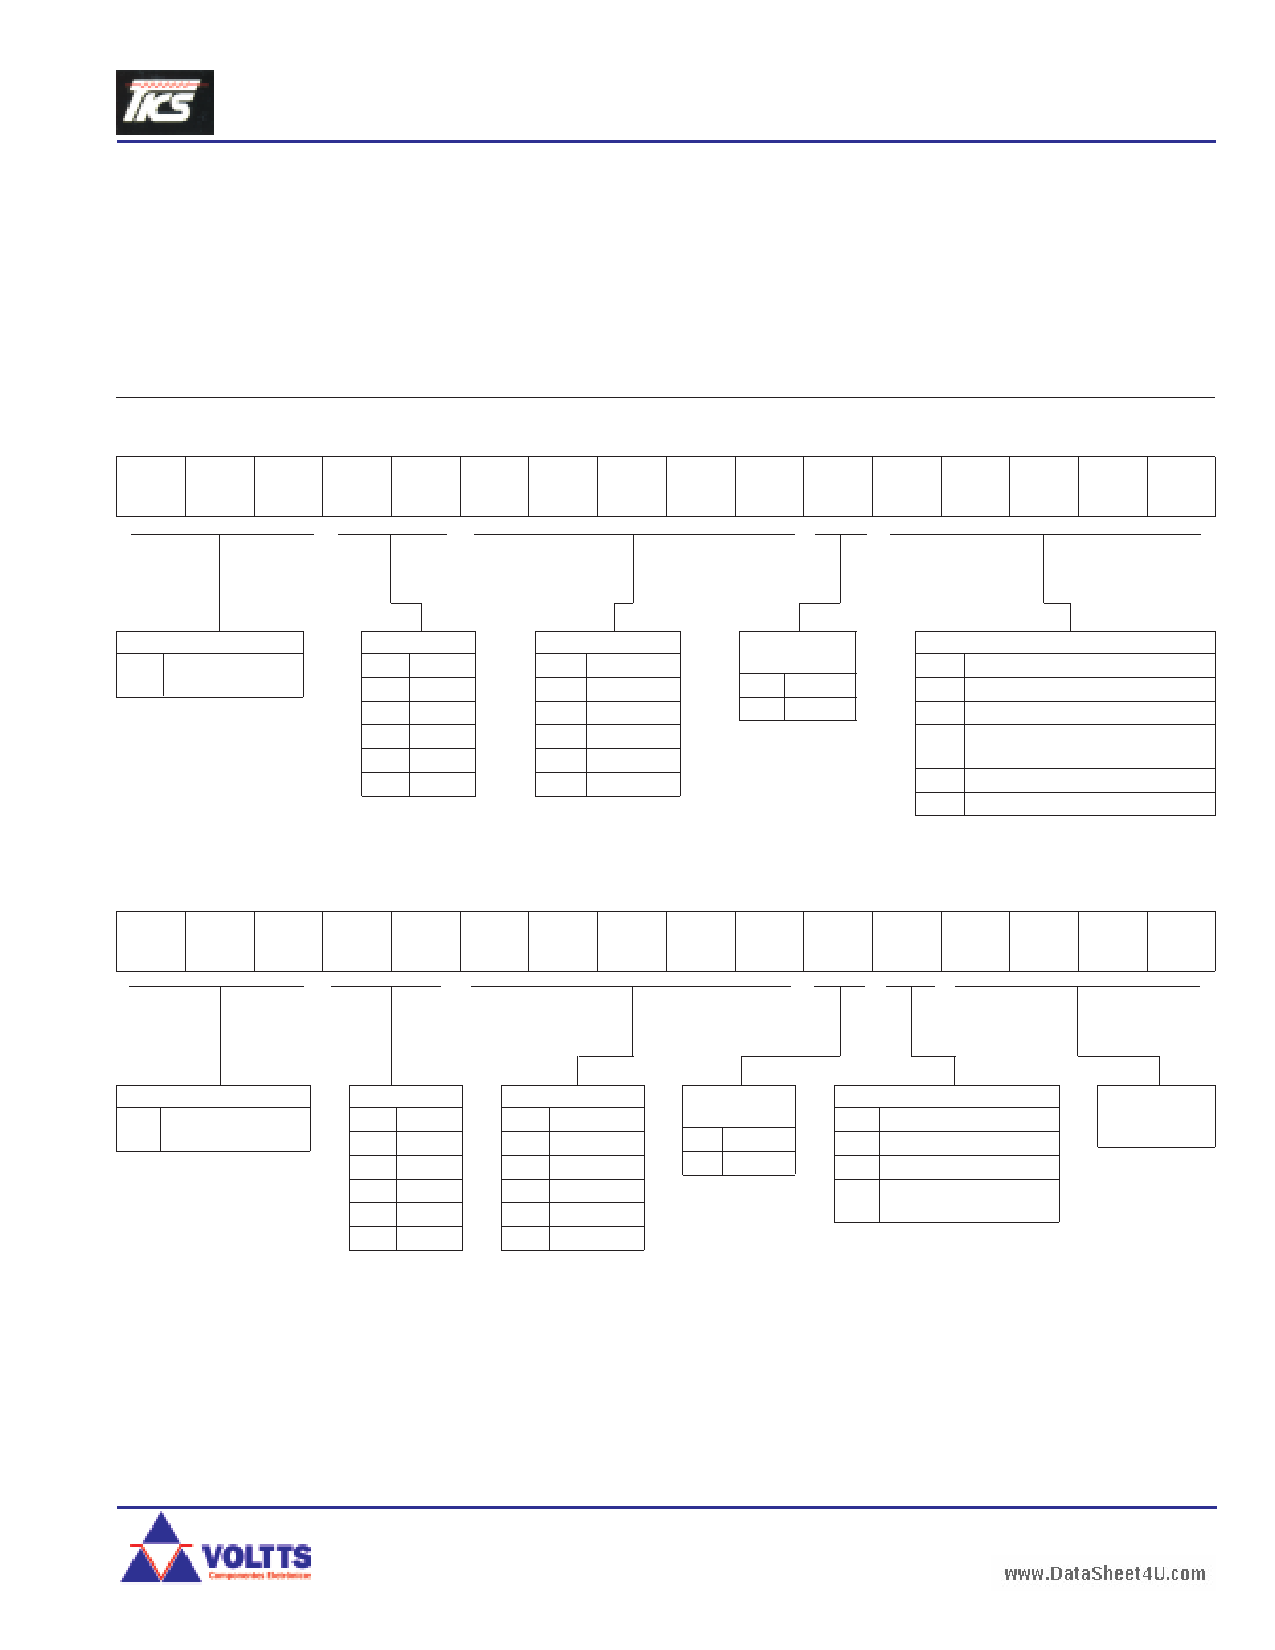 SCK-053 datasheet pinout